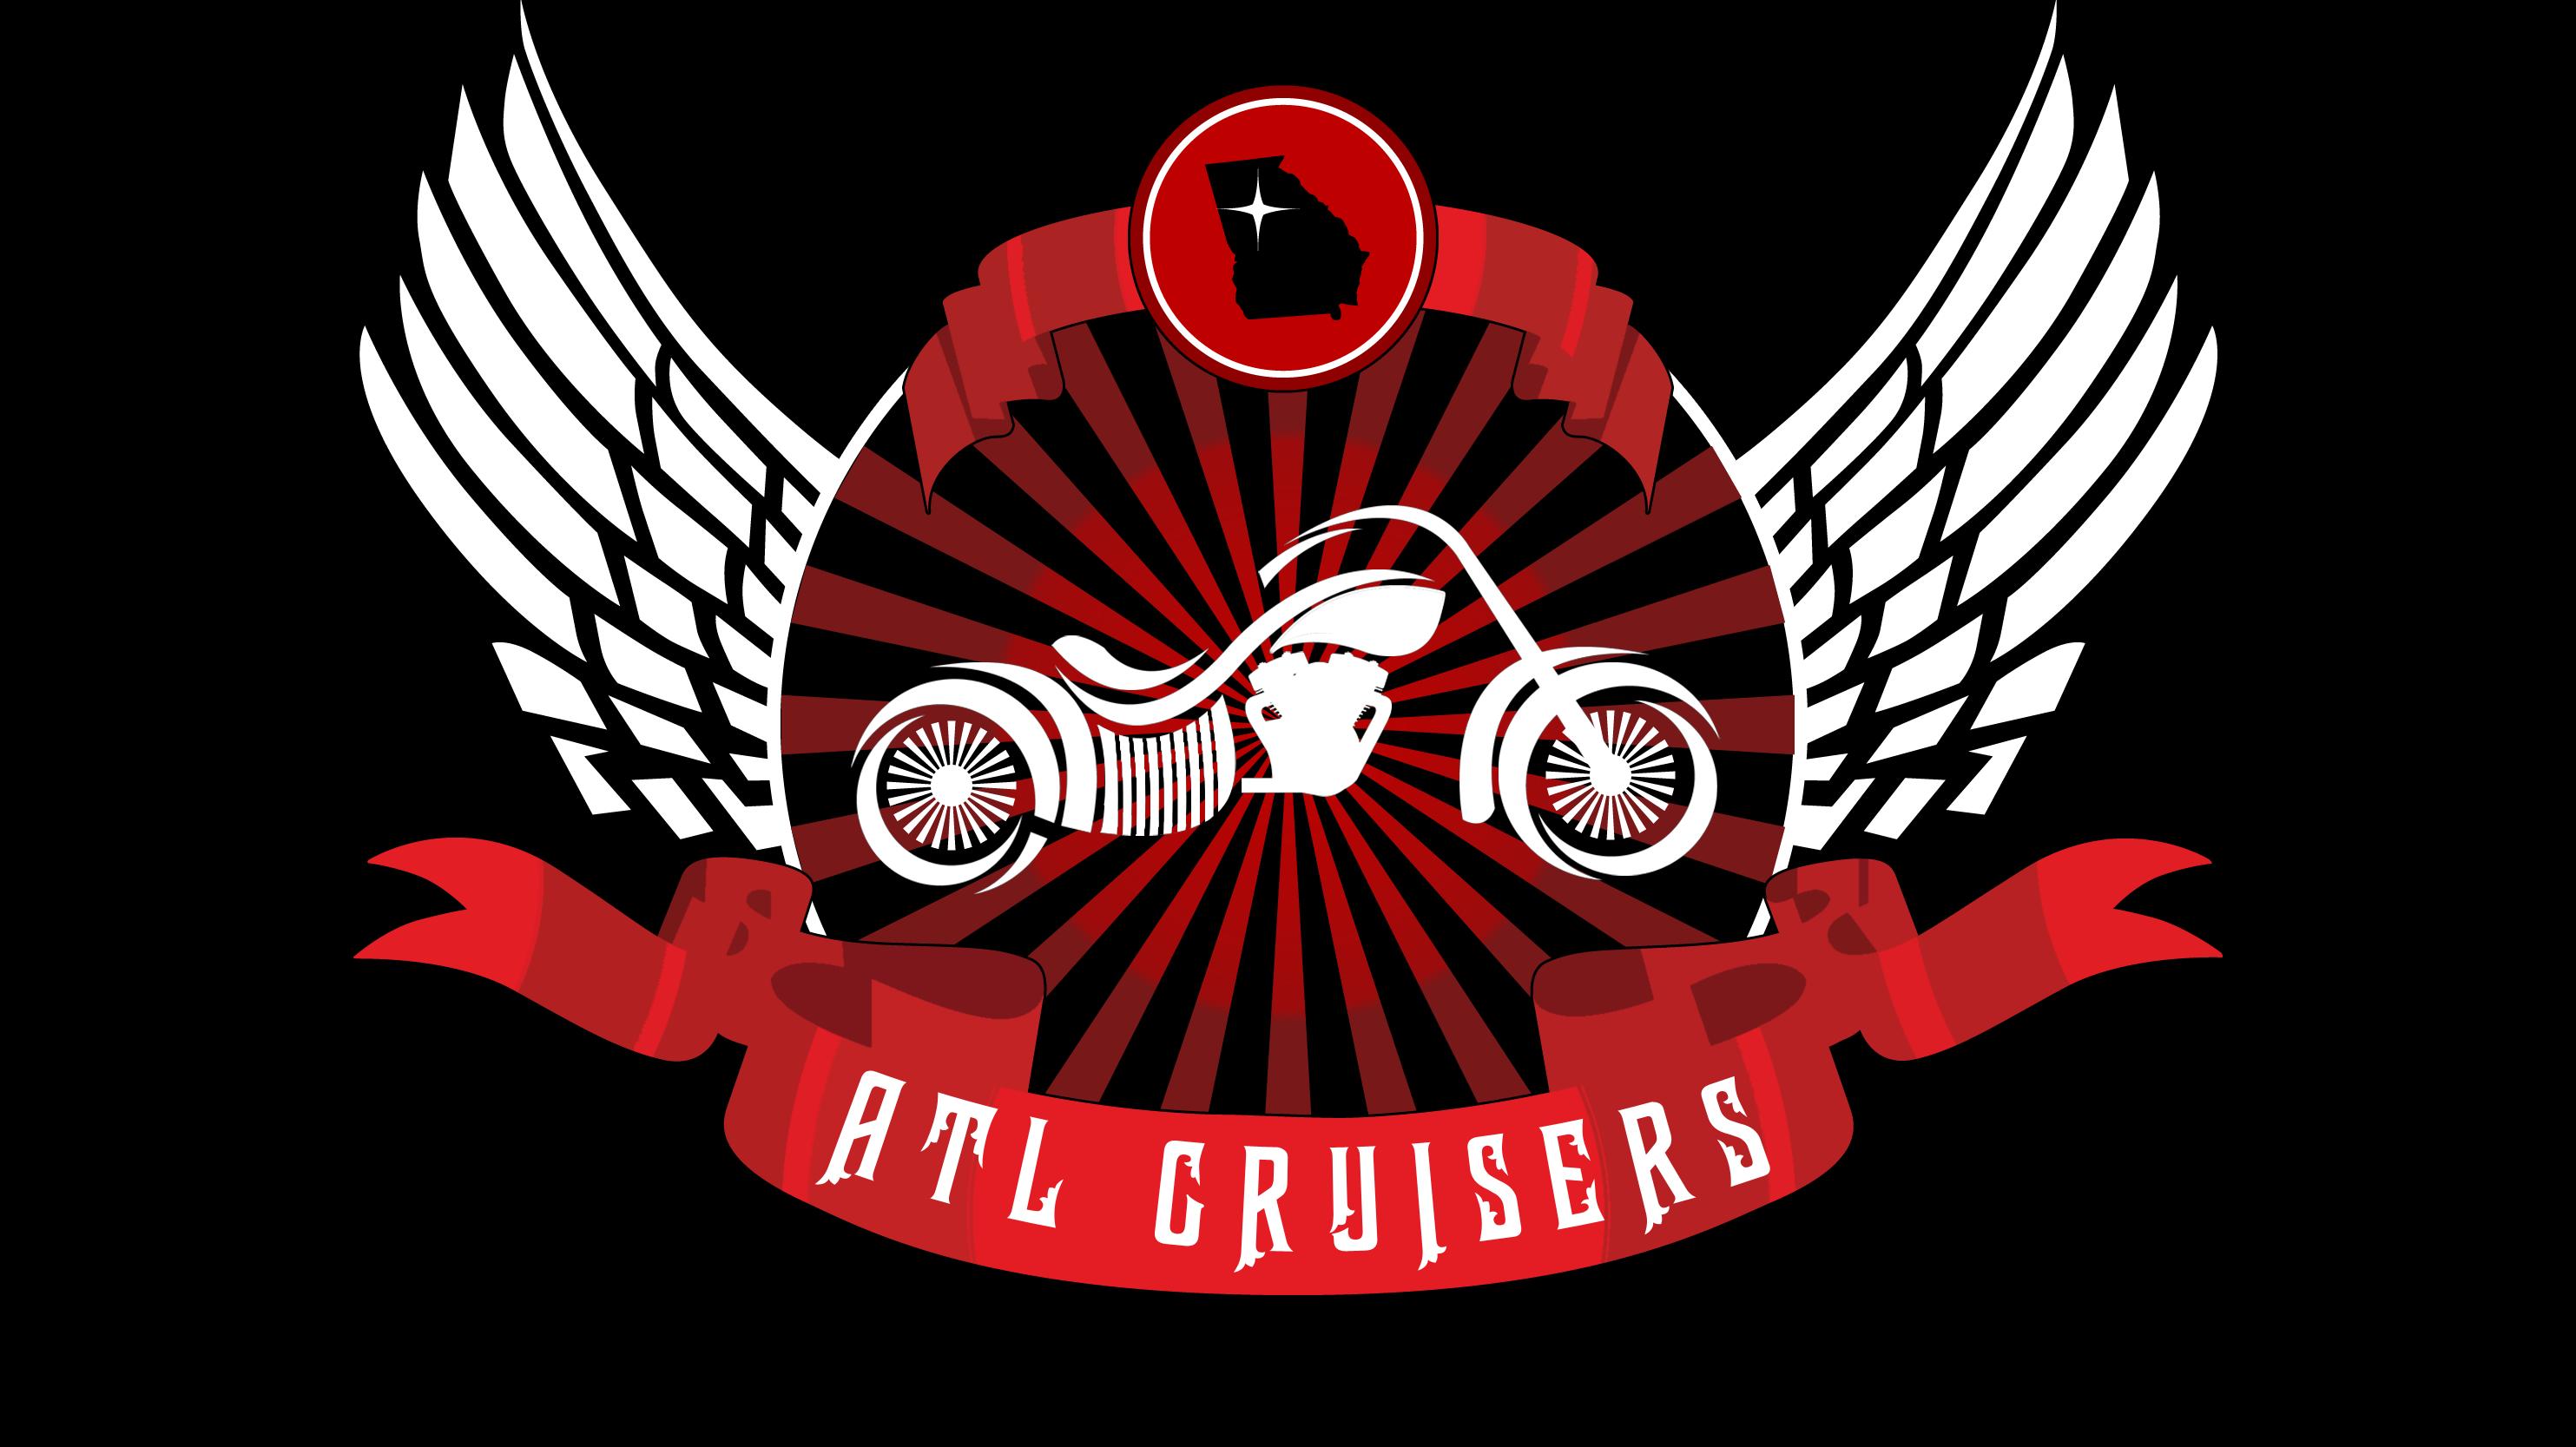 National black bikers roundup 2016 - 2016 National Bikers Roundup Nbr Atl Cruisers Atlanta Ga Meetup